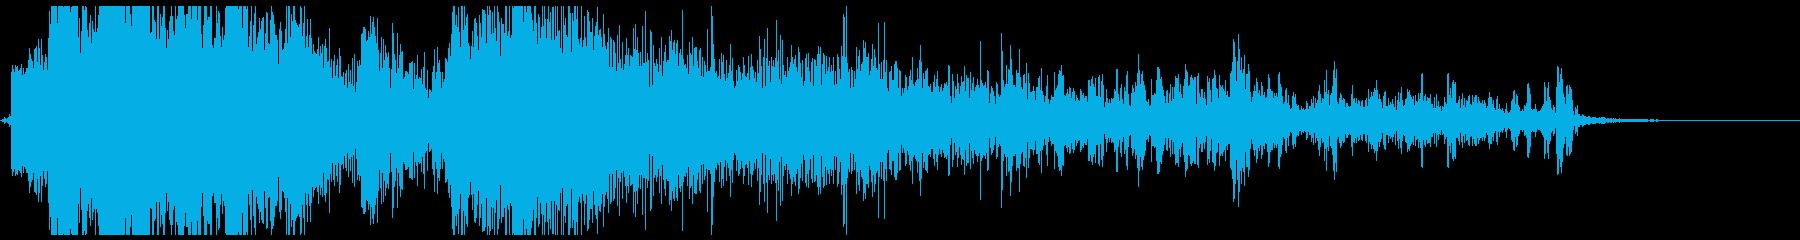 METAL DRUMS CRASH...の再生済みの波形